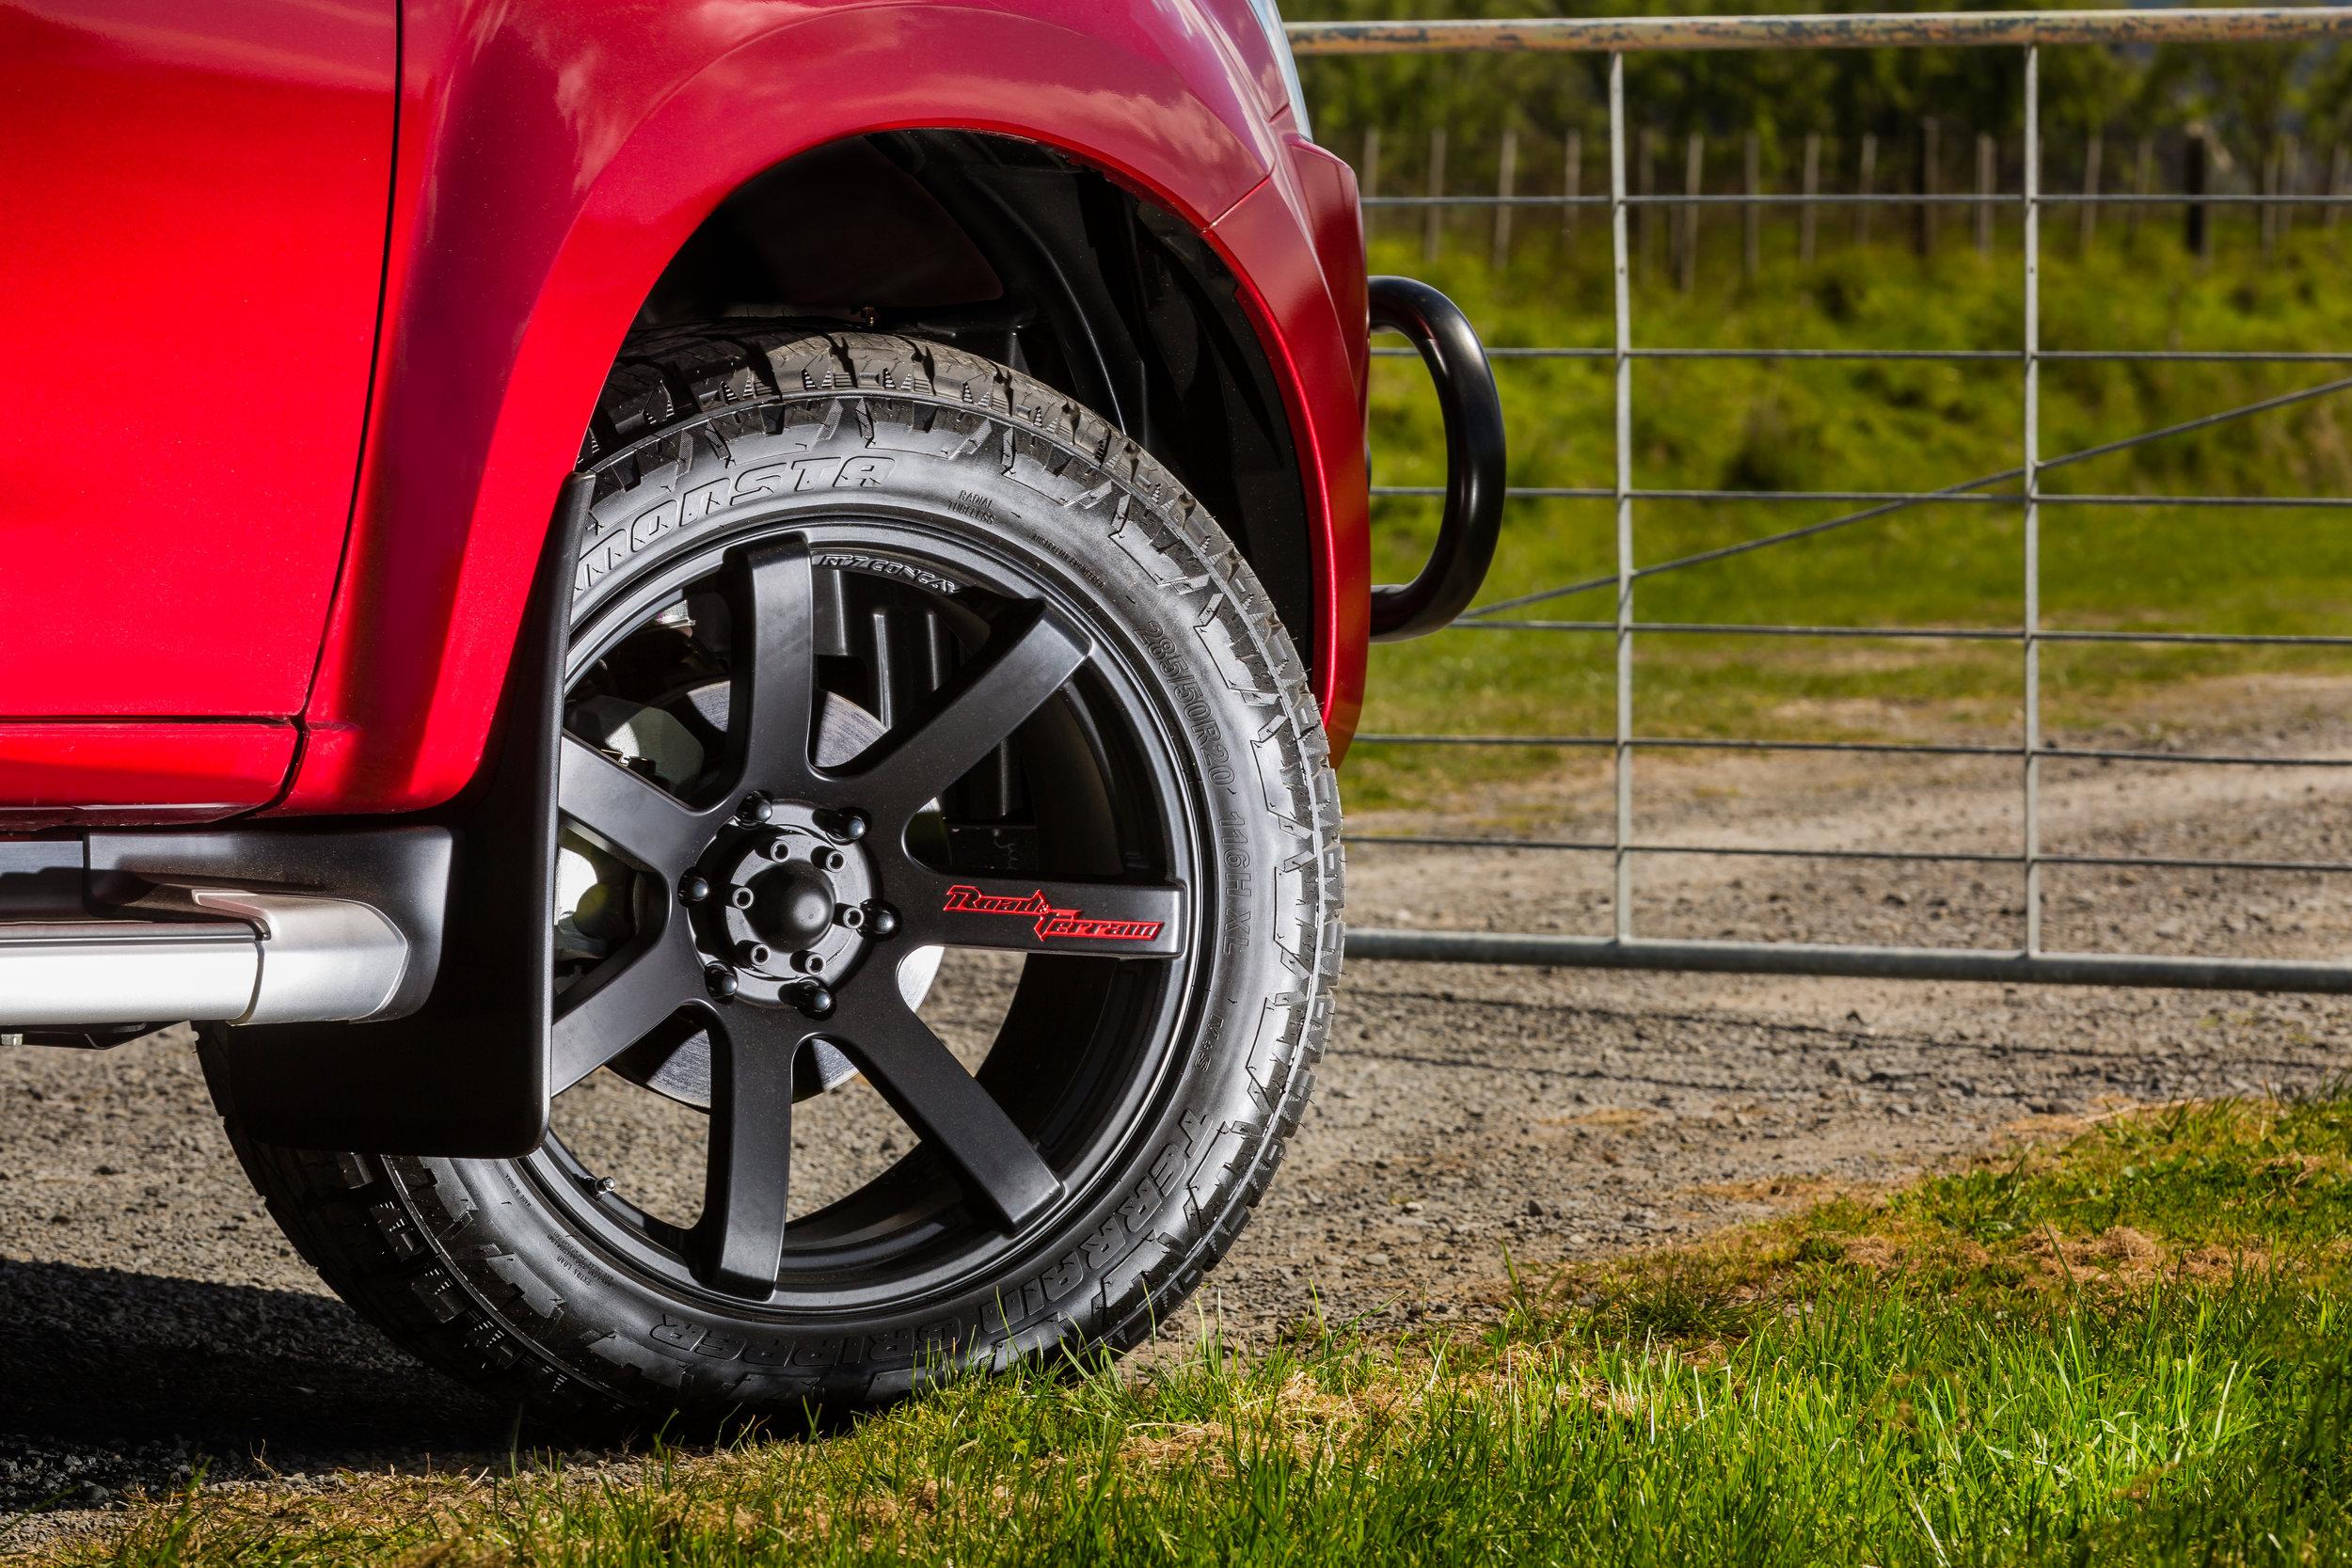 Isuzu D-Max wheel and tyre detail